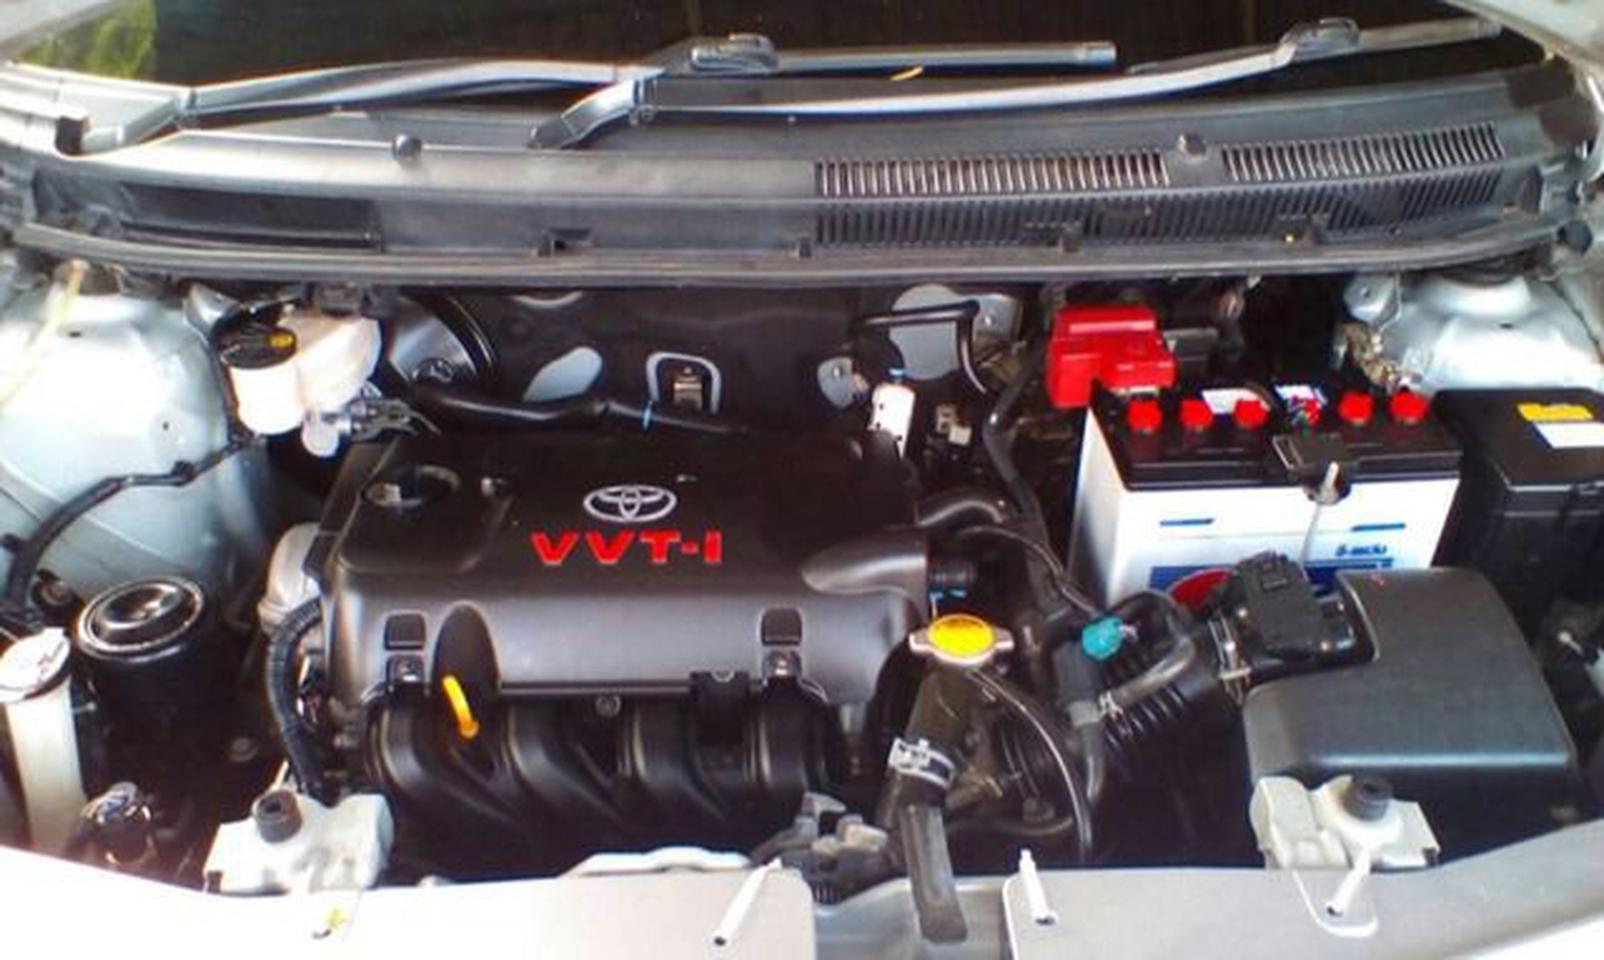 Toyota vios 1.5 Ev ปี2011 รถสวย นางฟ้า มีของแถม รูปที่ 5